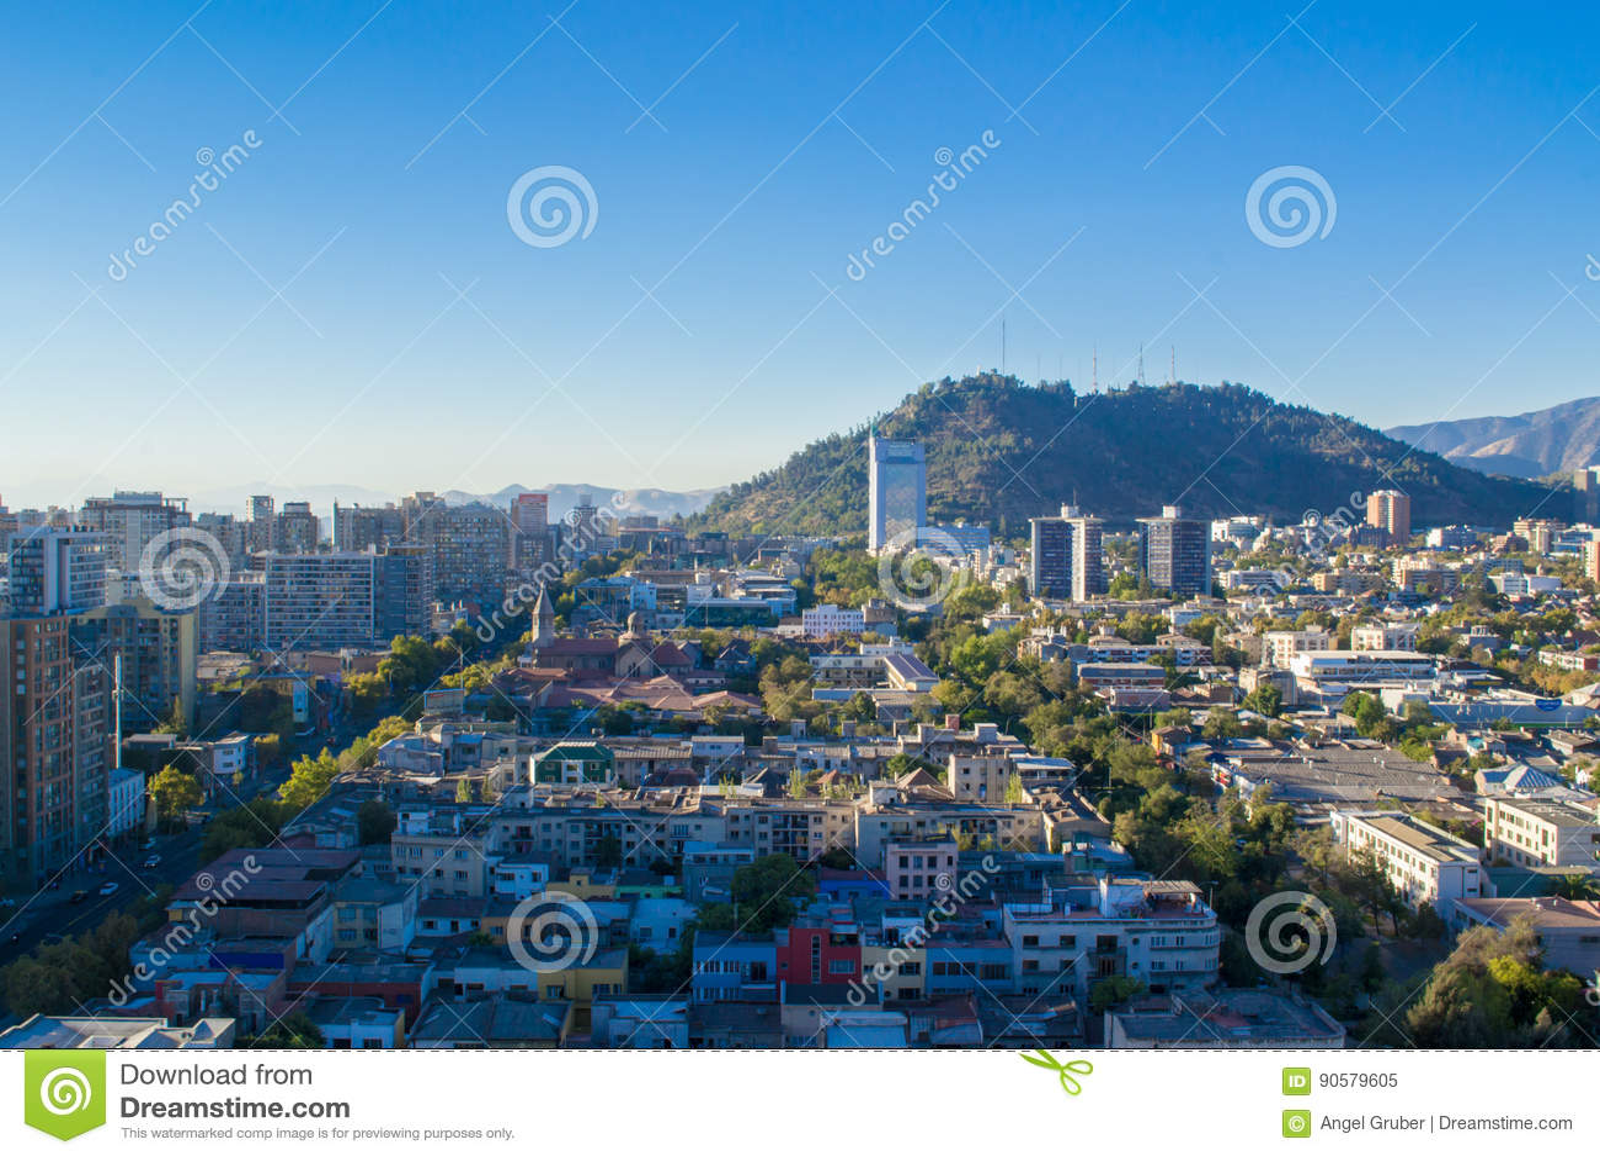 Santiago city in Chile